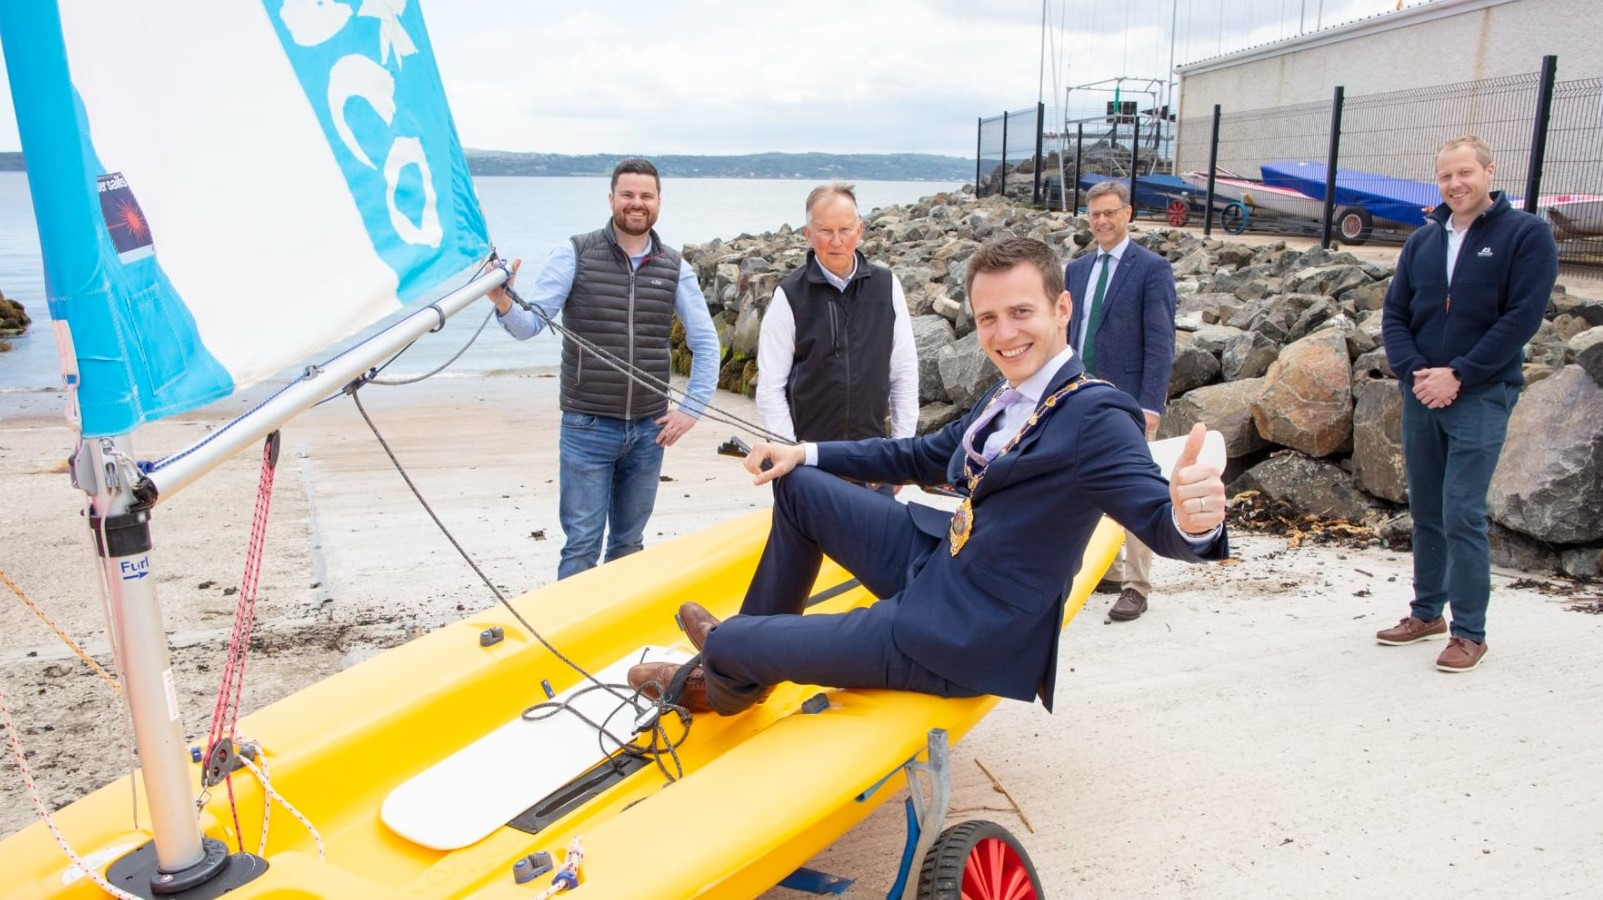 Plain Sailing For MEA Council And Carrickfergus Sailing Club With OSM